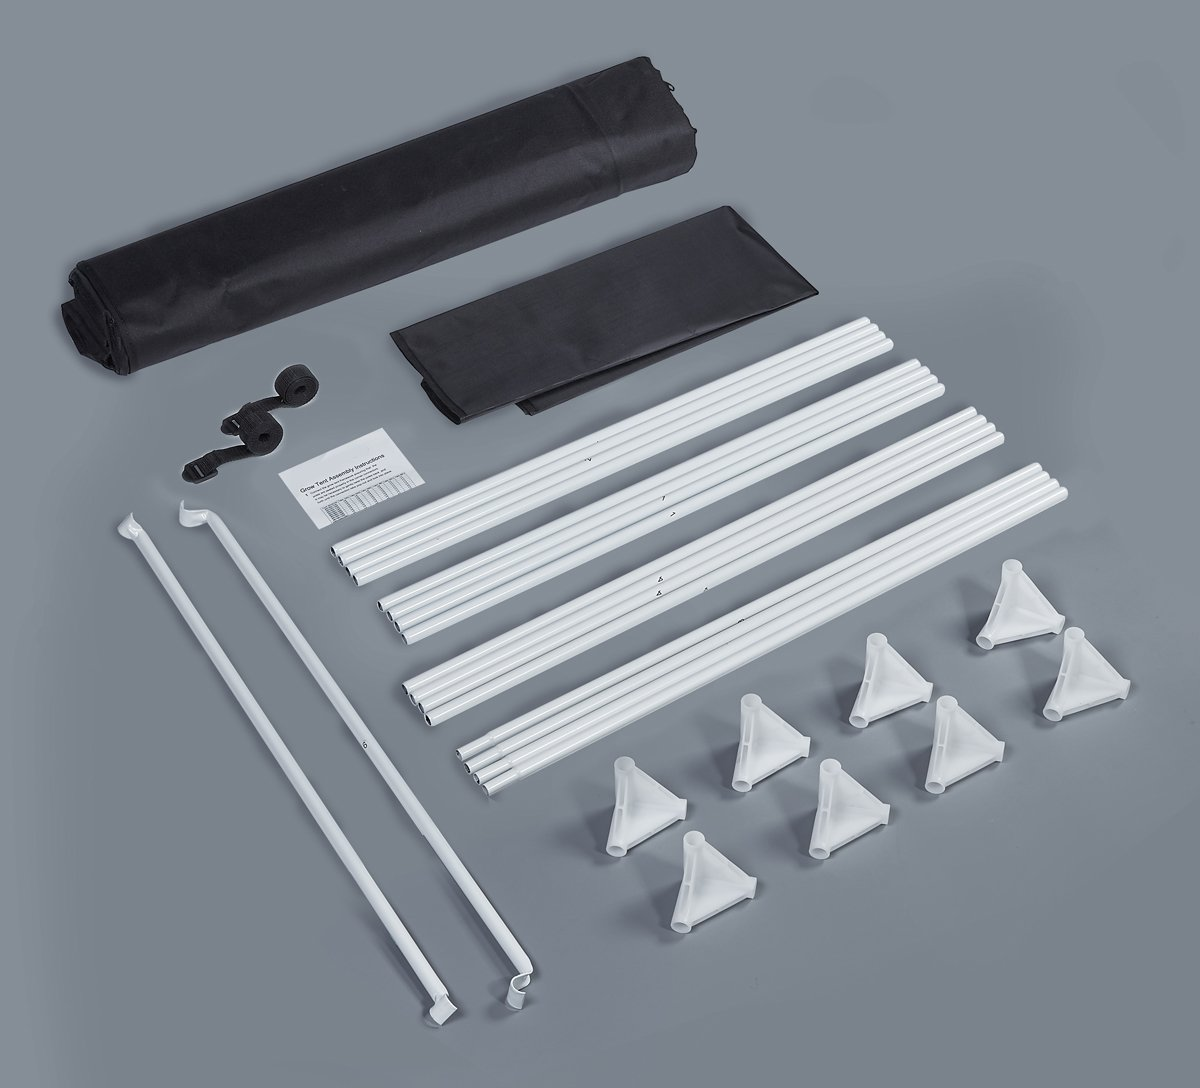 "TopoLite Full Range Multiple Sized 24""x24""x48"" 32""x32""x63"" 48""x24""x60"" 48""×48""×80"" 96""x48""x80"" 120""X120""X80"" Indoor Grow Tent Room 600D Mylar Hydroponic Growing Plant w/ Plastic Corner (32""X32""X63"")"